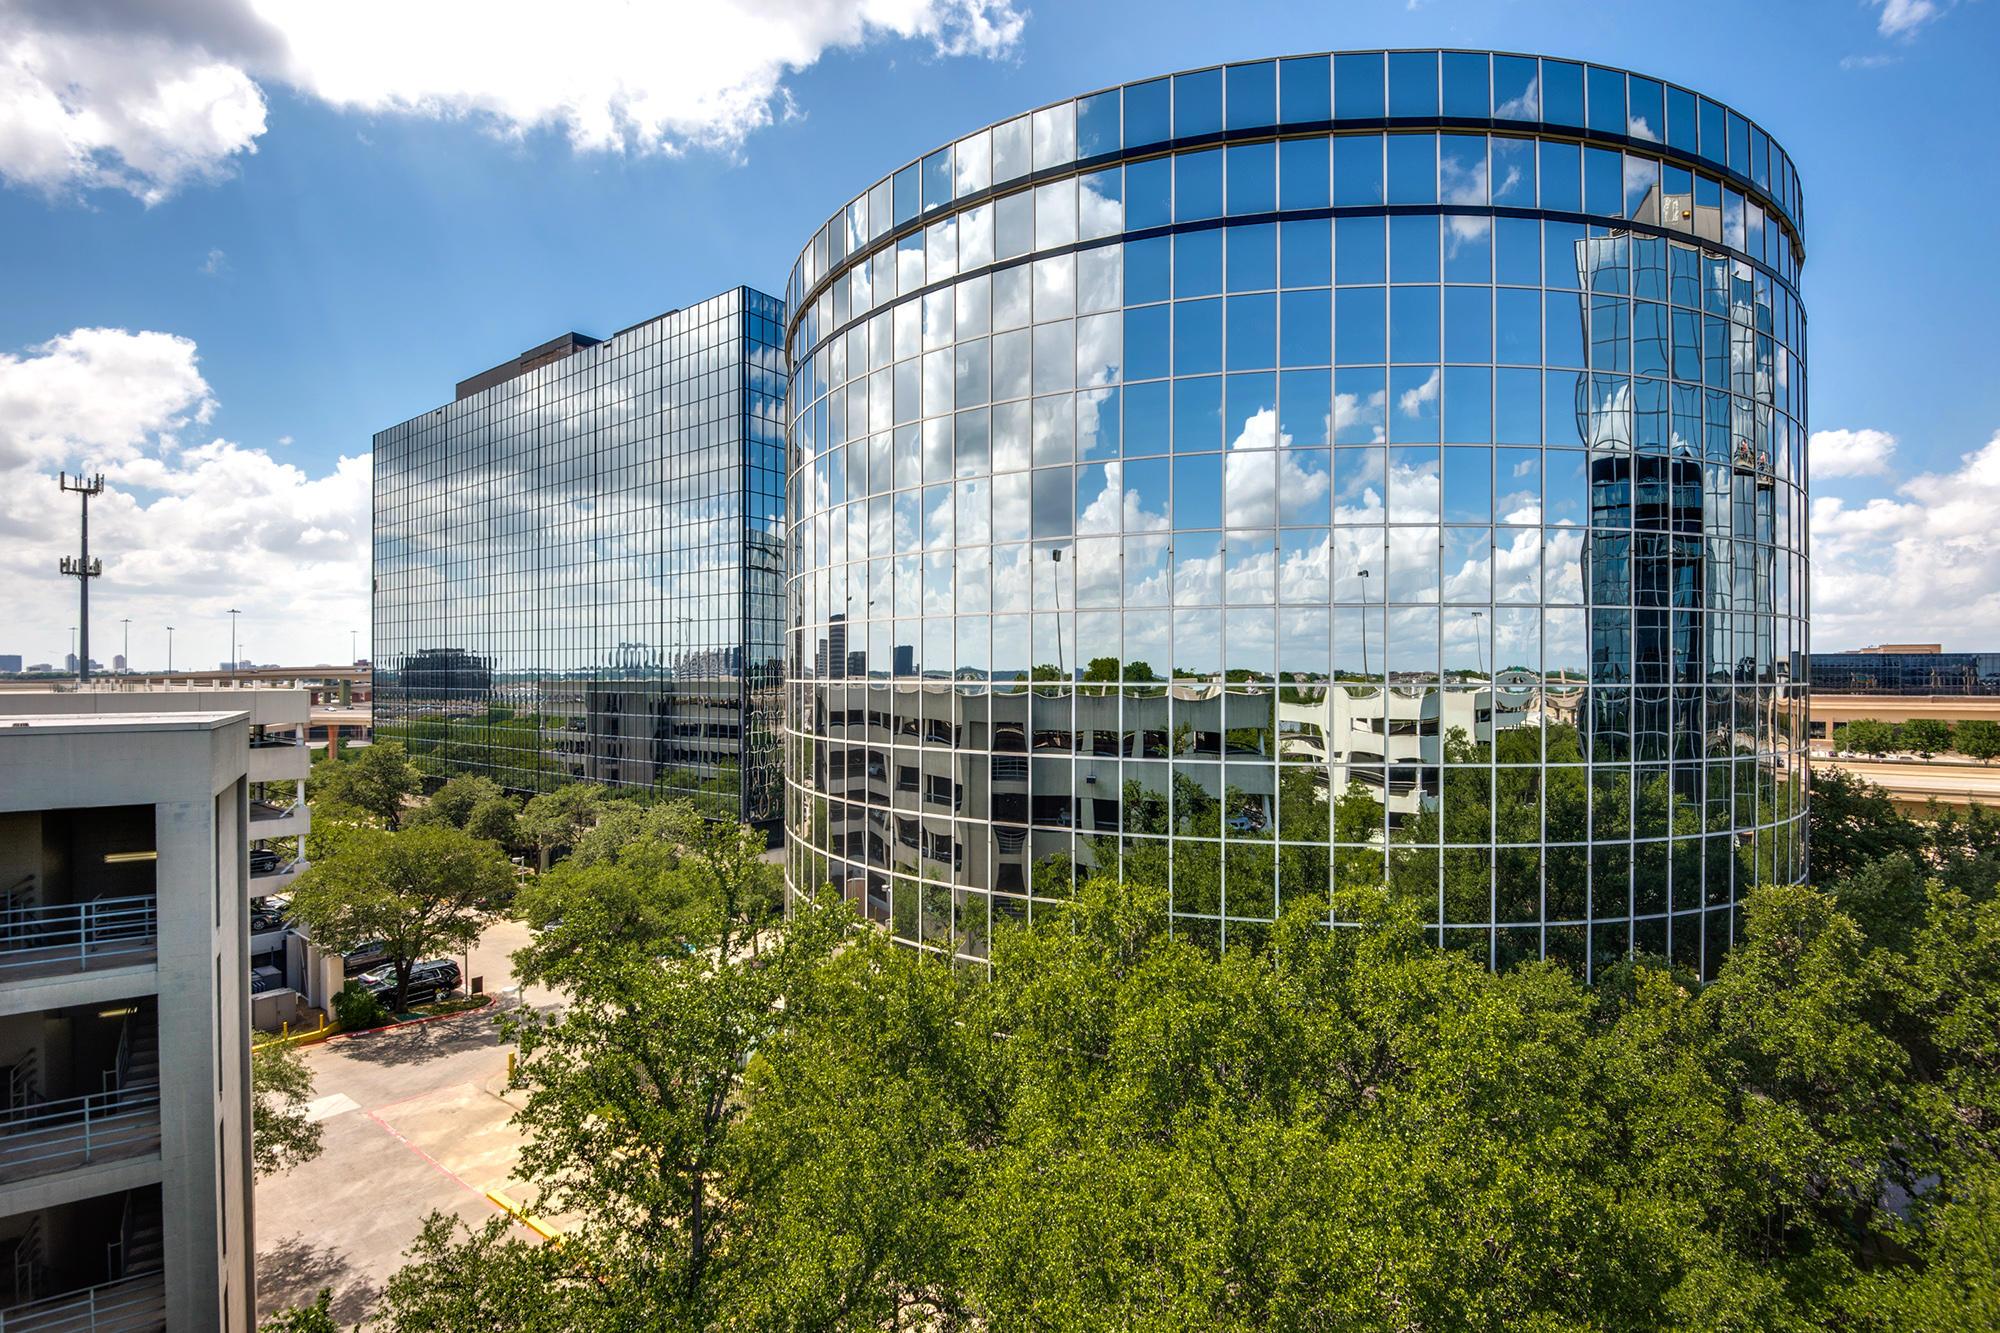 Colleges In Dallas Texas >> Arizona College Of Nursing Dallas 8330 Lyndon B Johnson